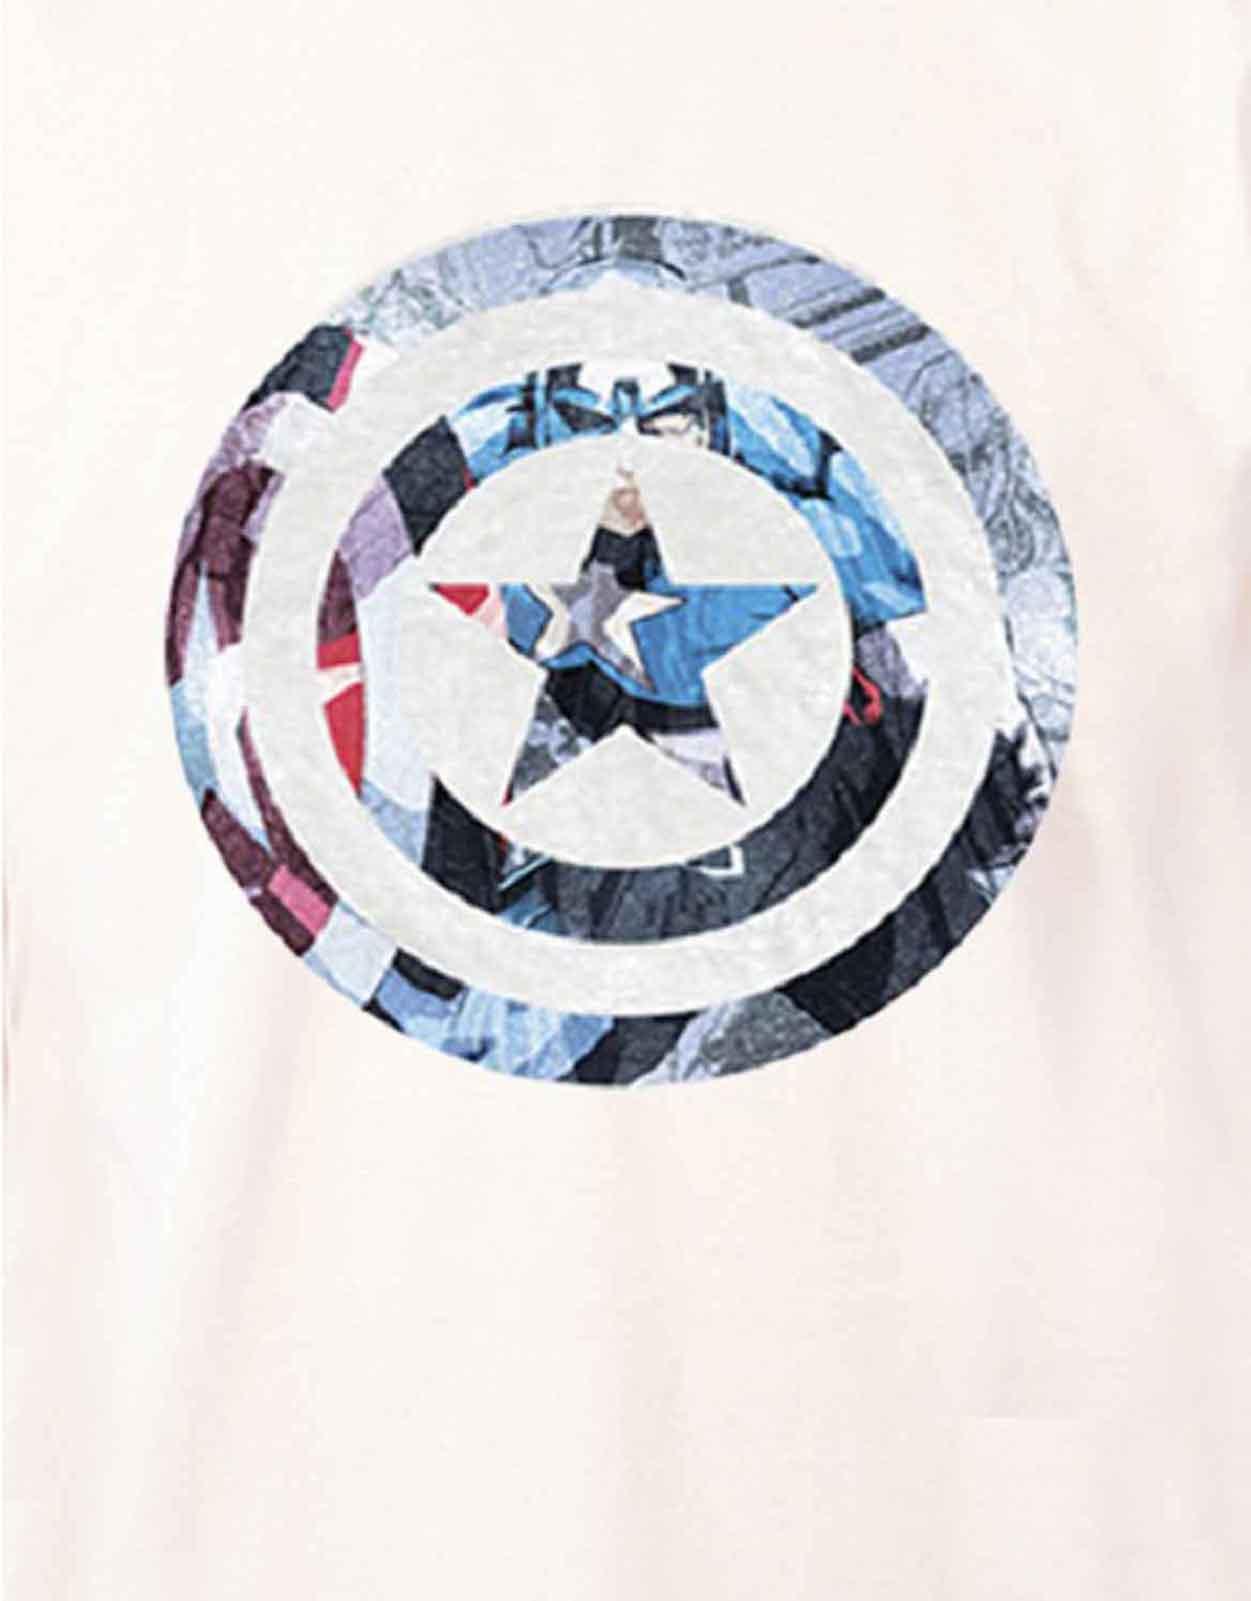 Captain-America-T-Shirt-official-Marvel-civil-war-daredevil-Thor-Hulk-Iron-Man